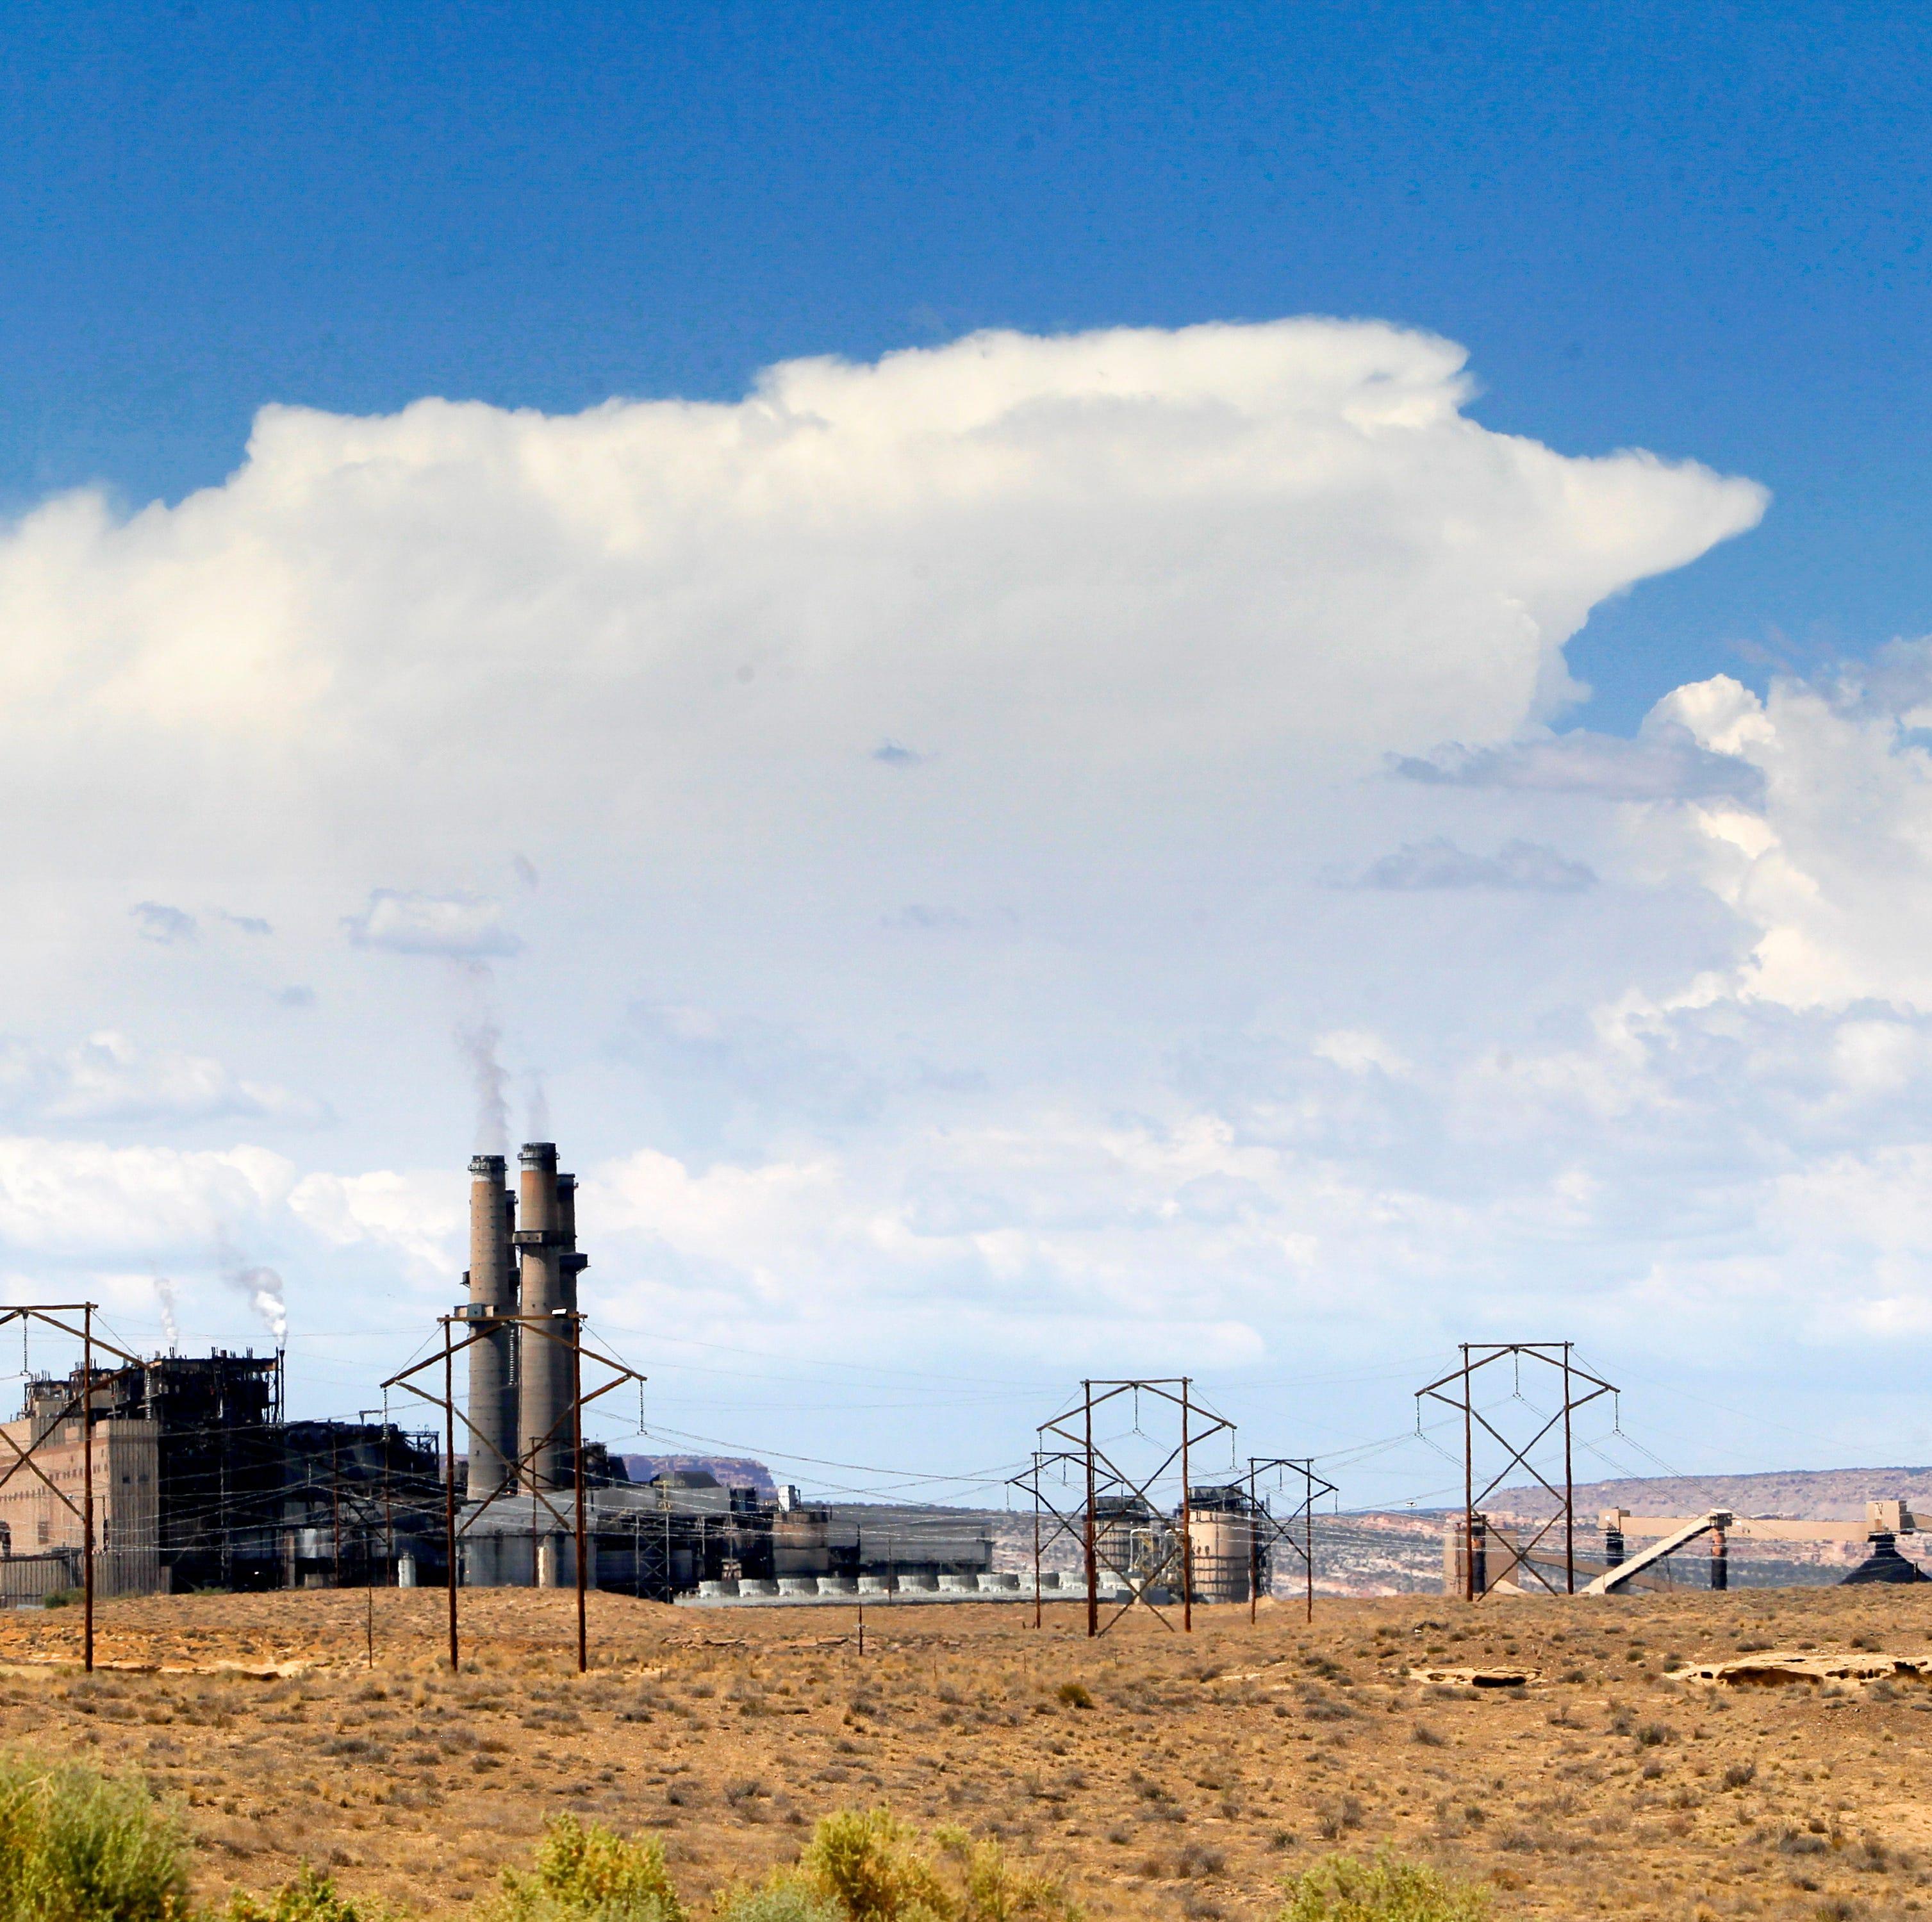 Legislators will discuss impacts of closing San Juan Generating Station